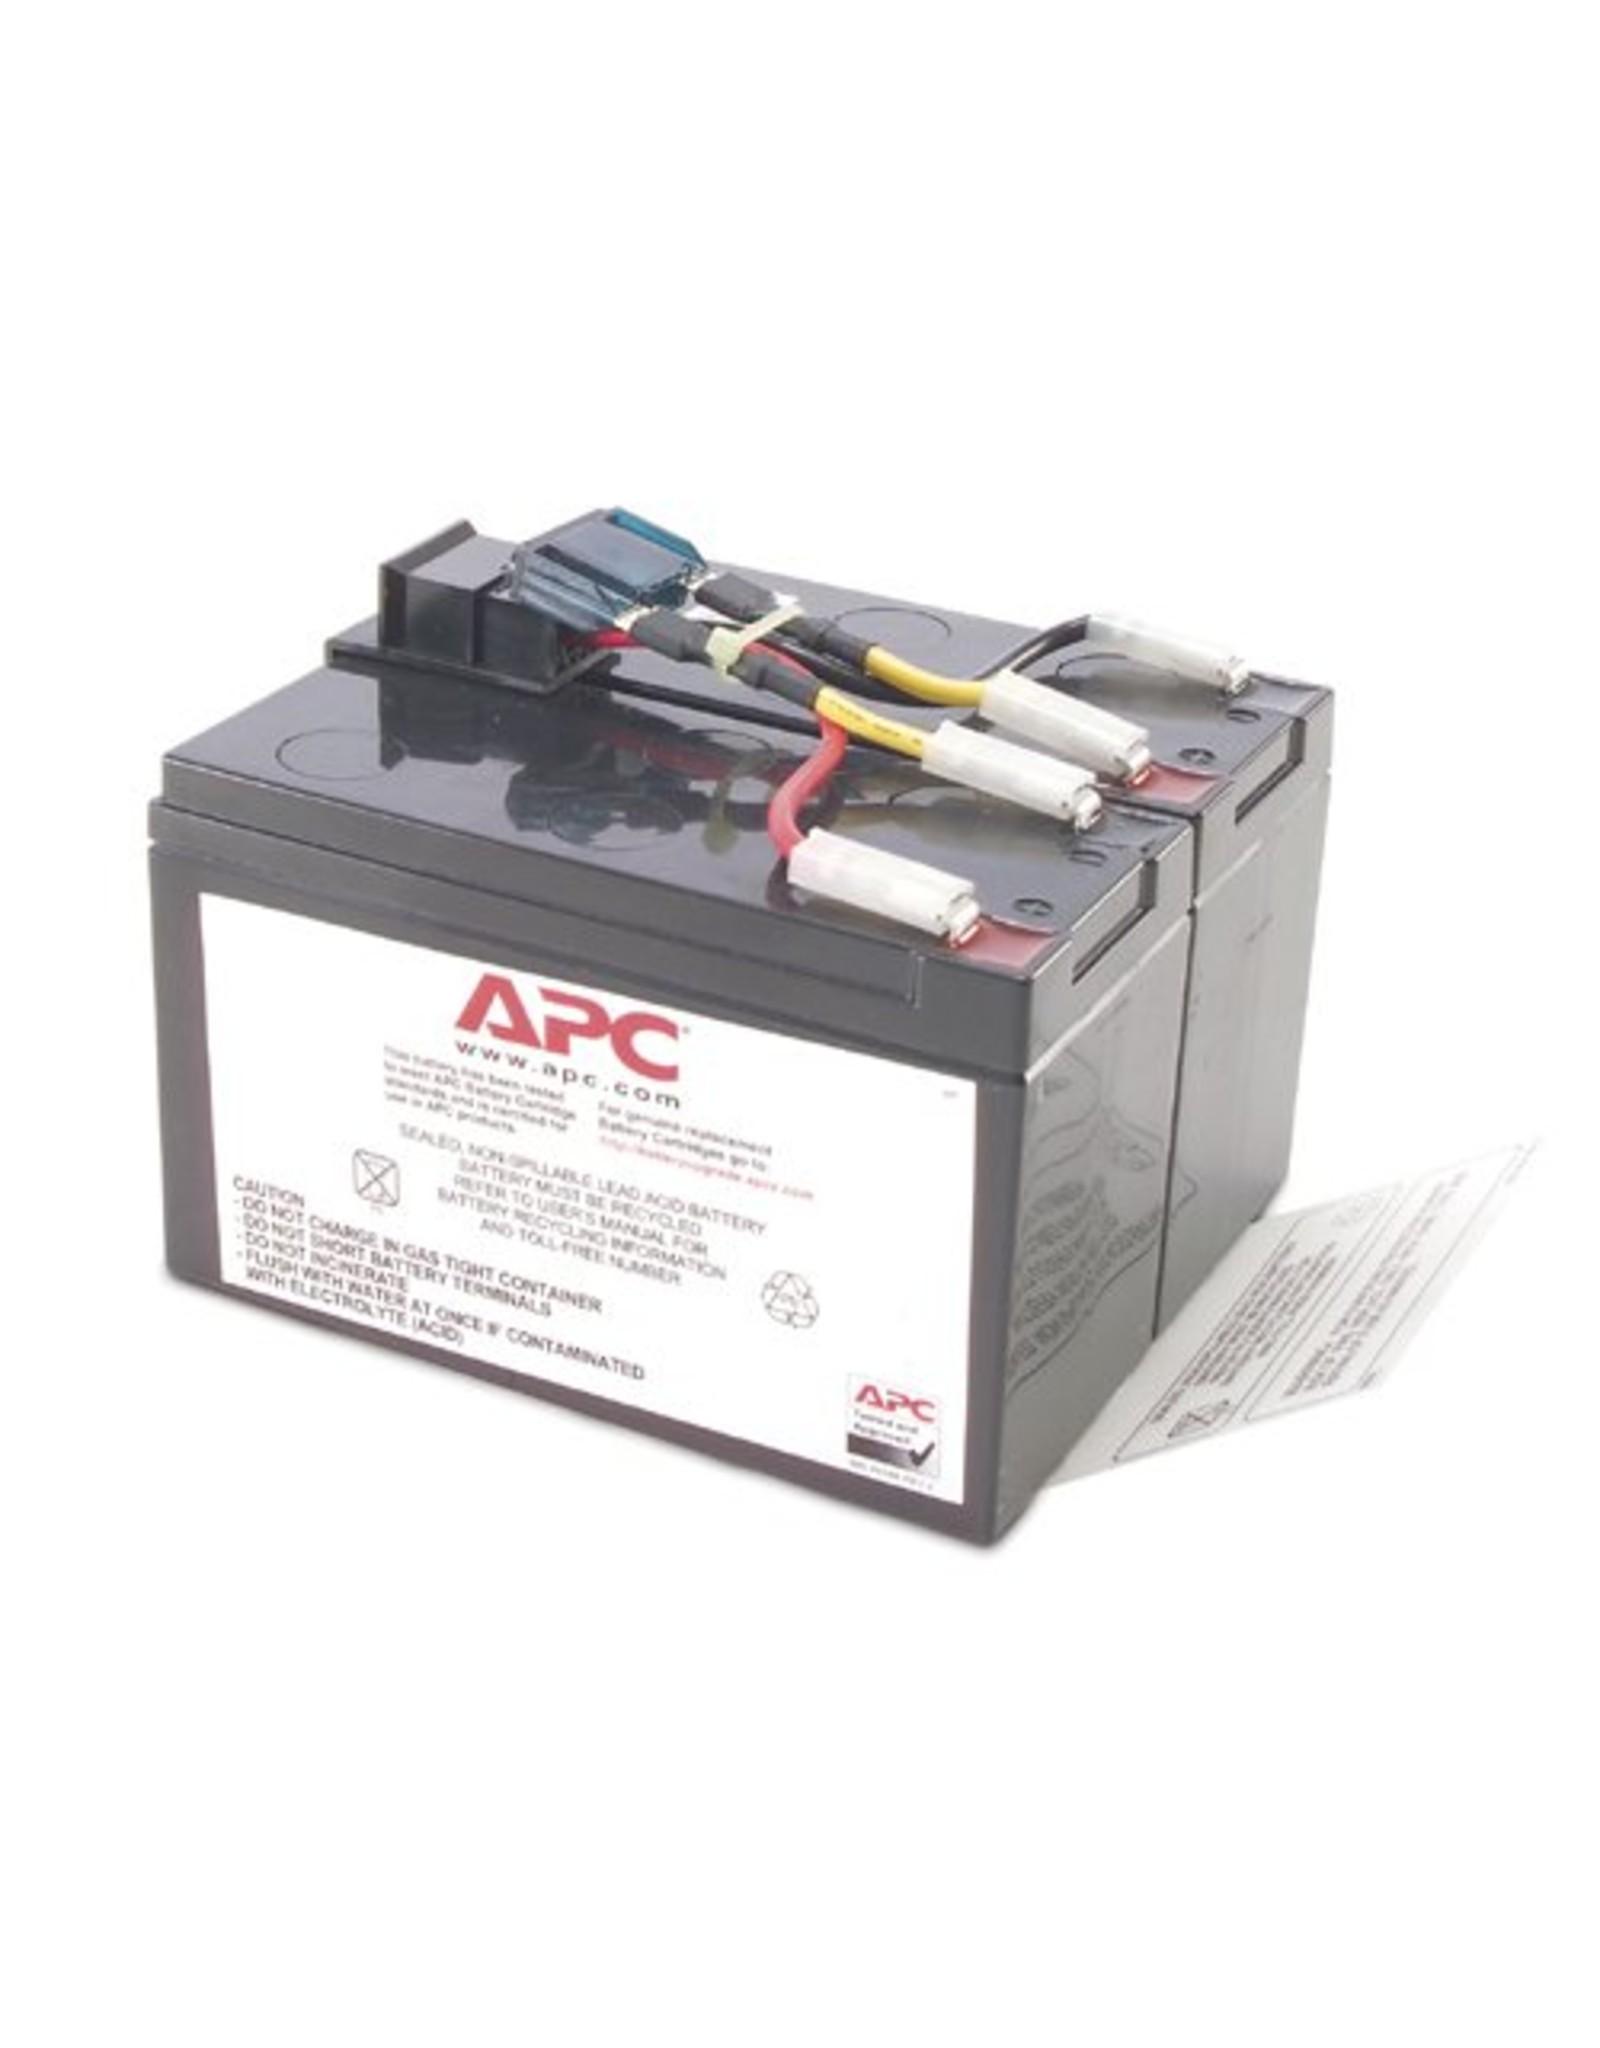 APC APC Replacement Battery Cartridge #48